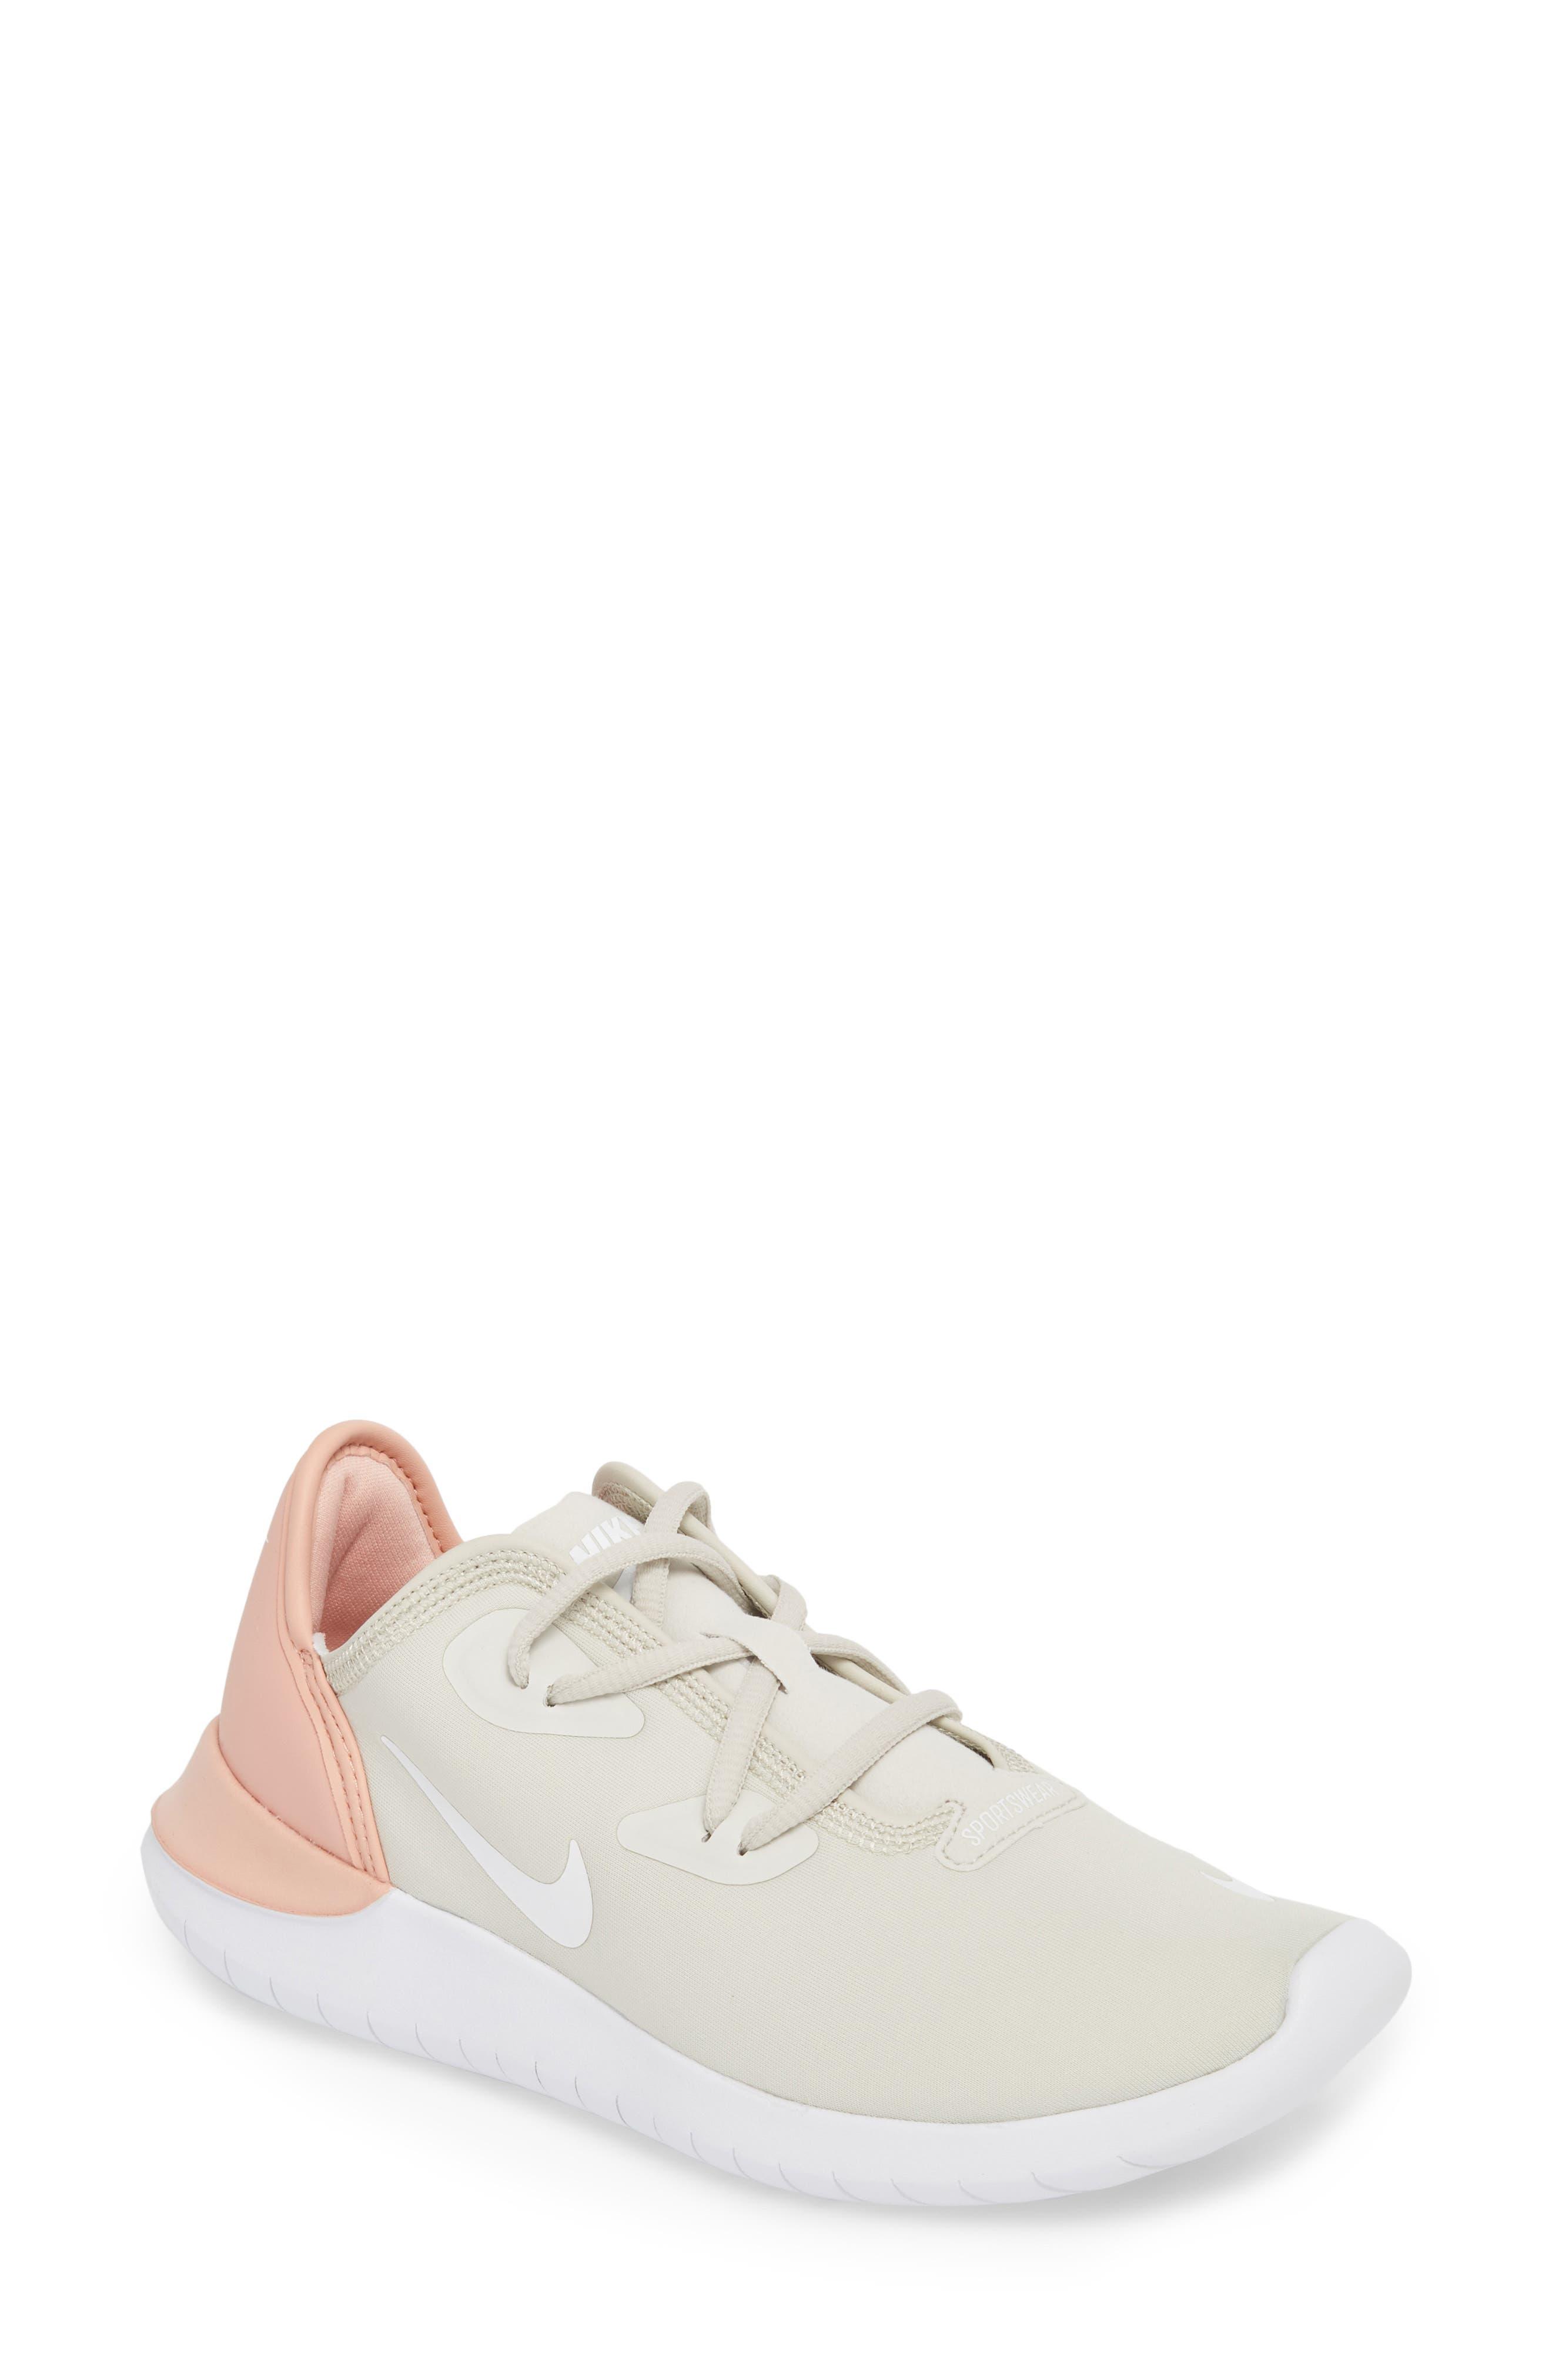 Hakata Sneaker,                         Main,                         color, Light Bone/ White/ Coral